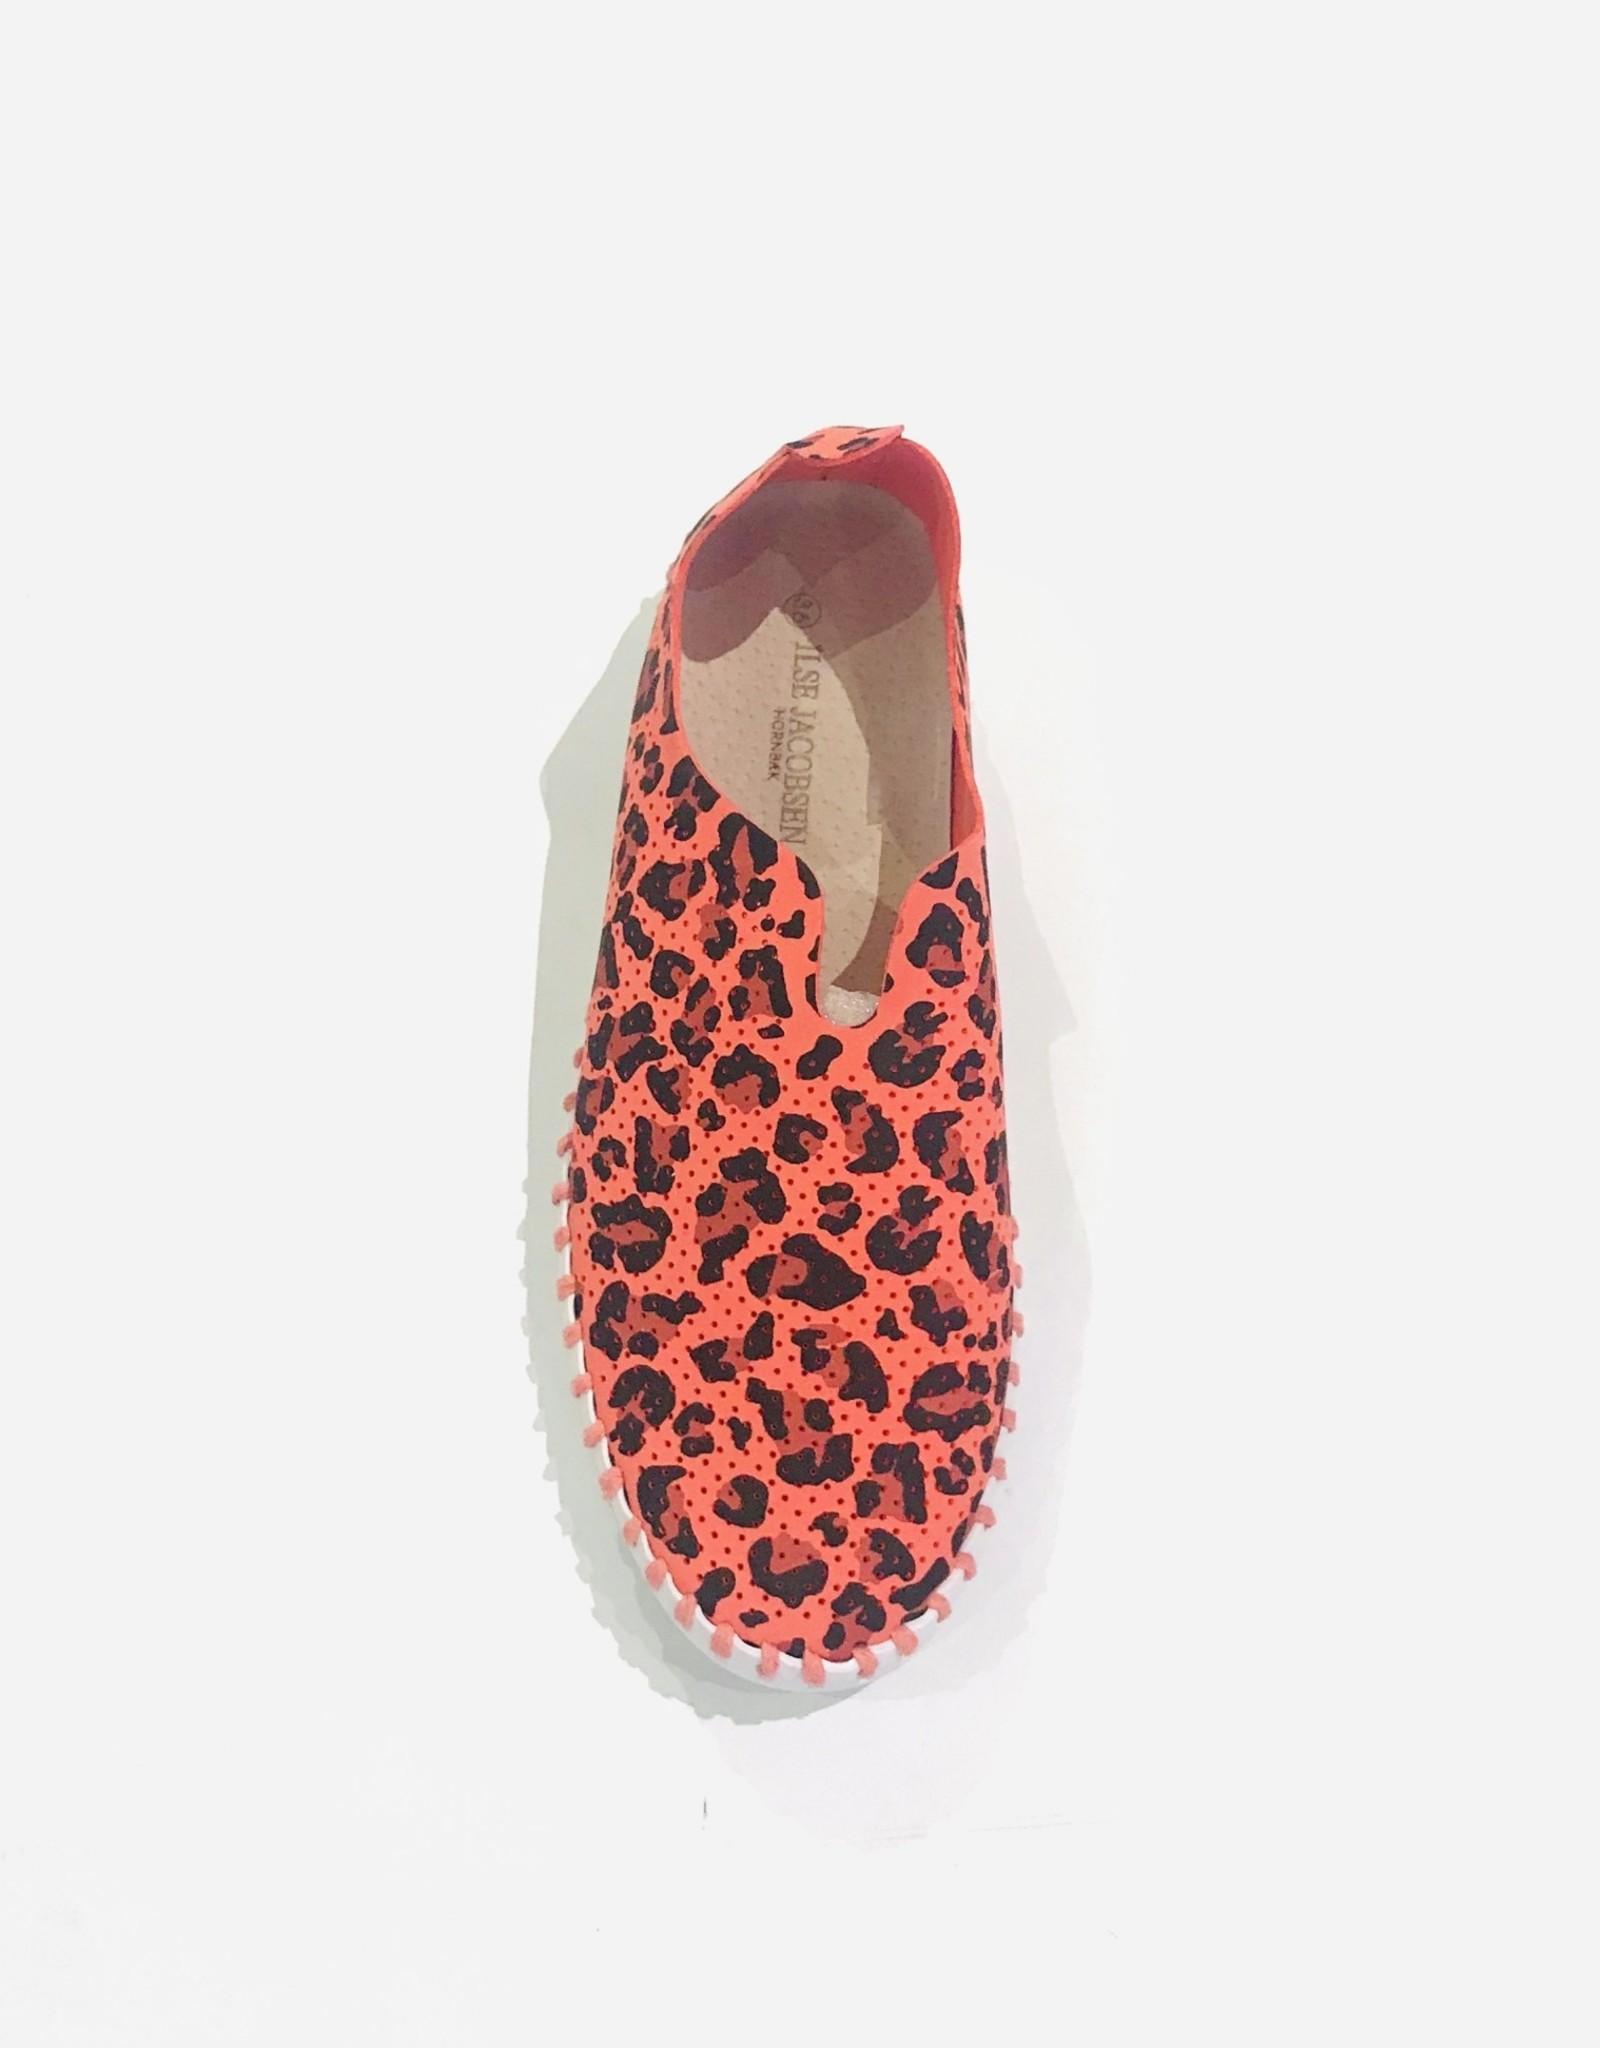 Ilse-Tulip Shoe Patterned